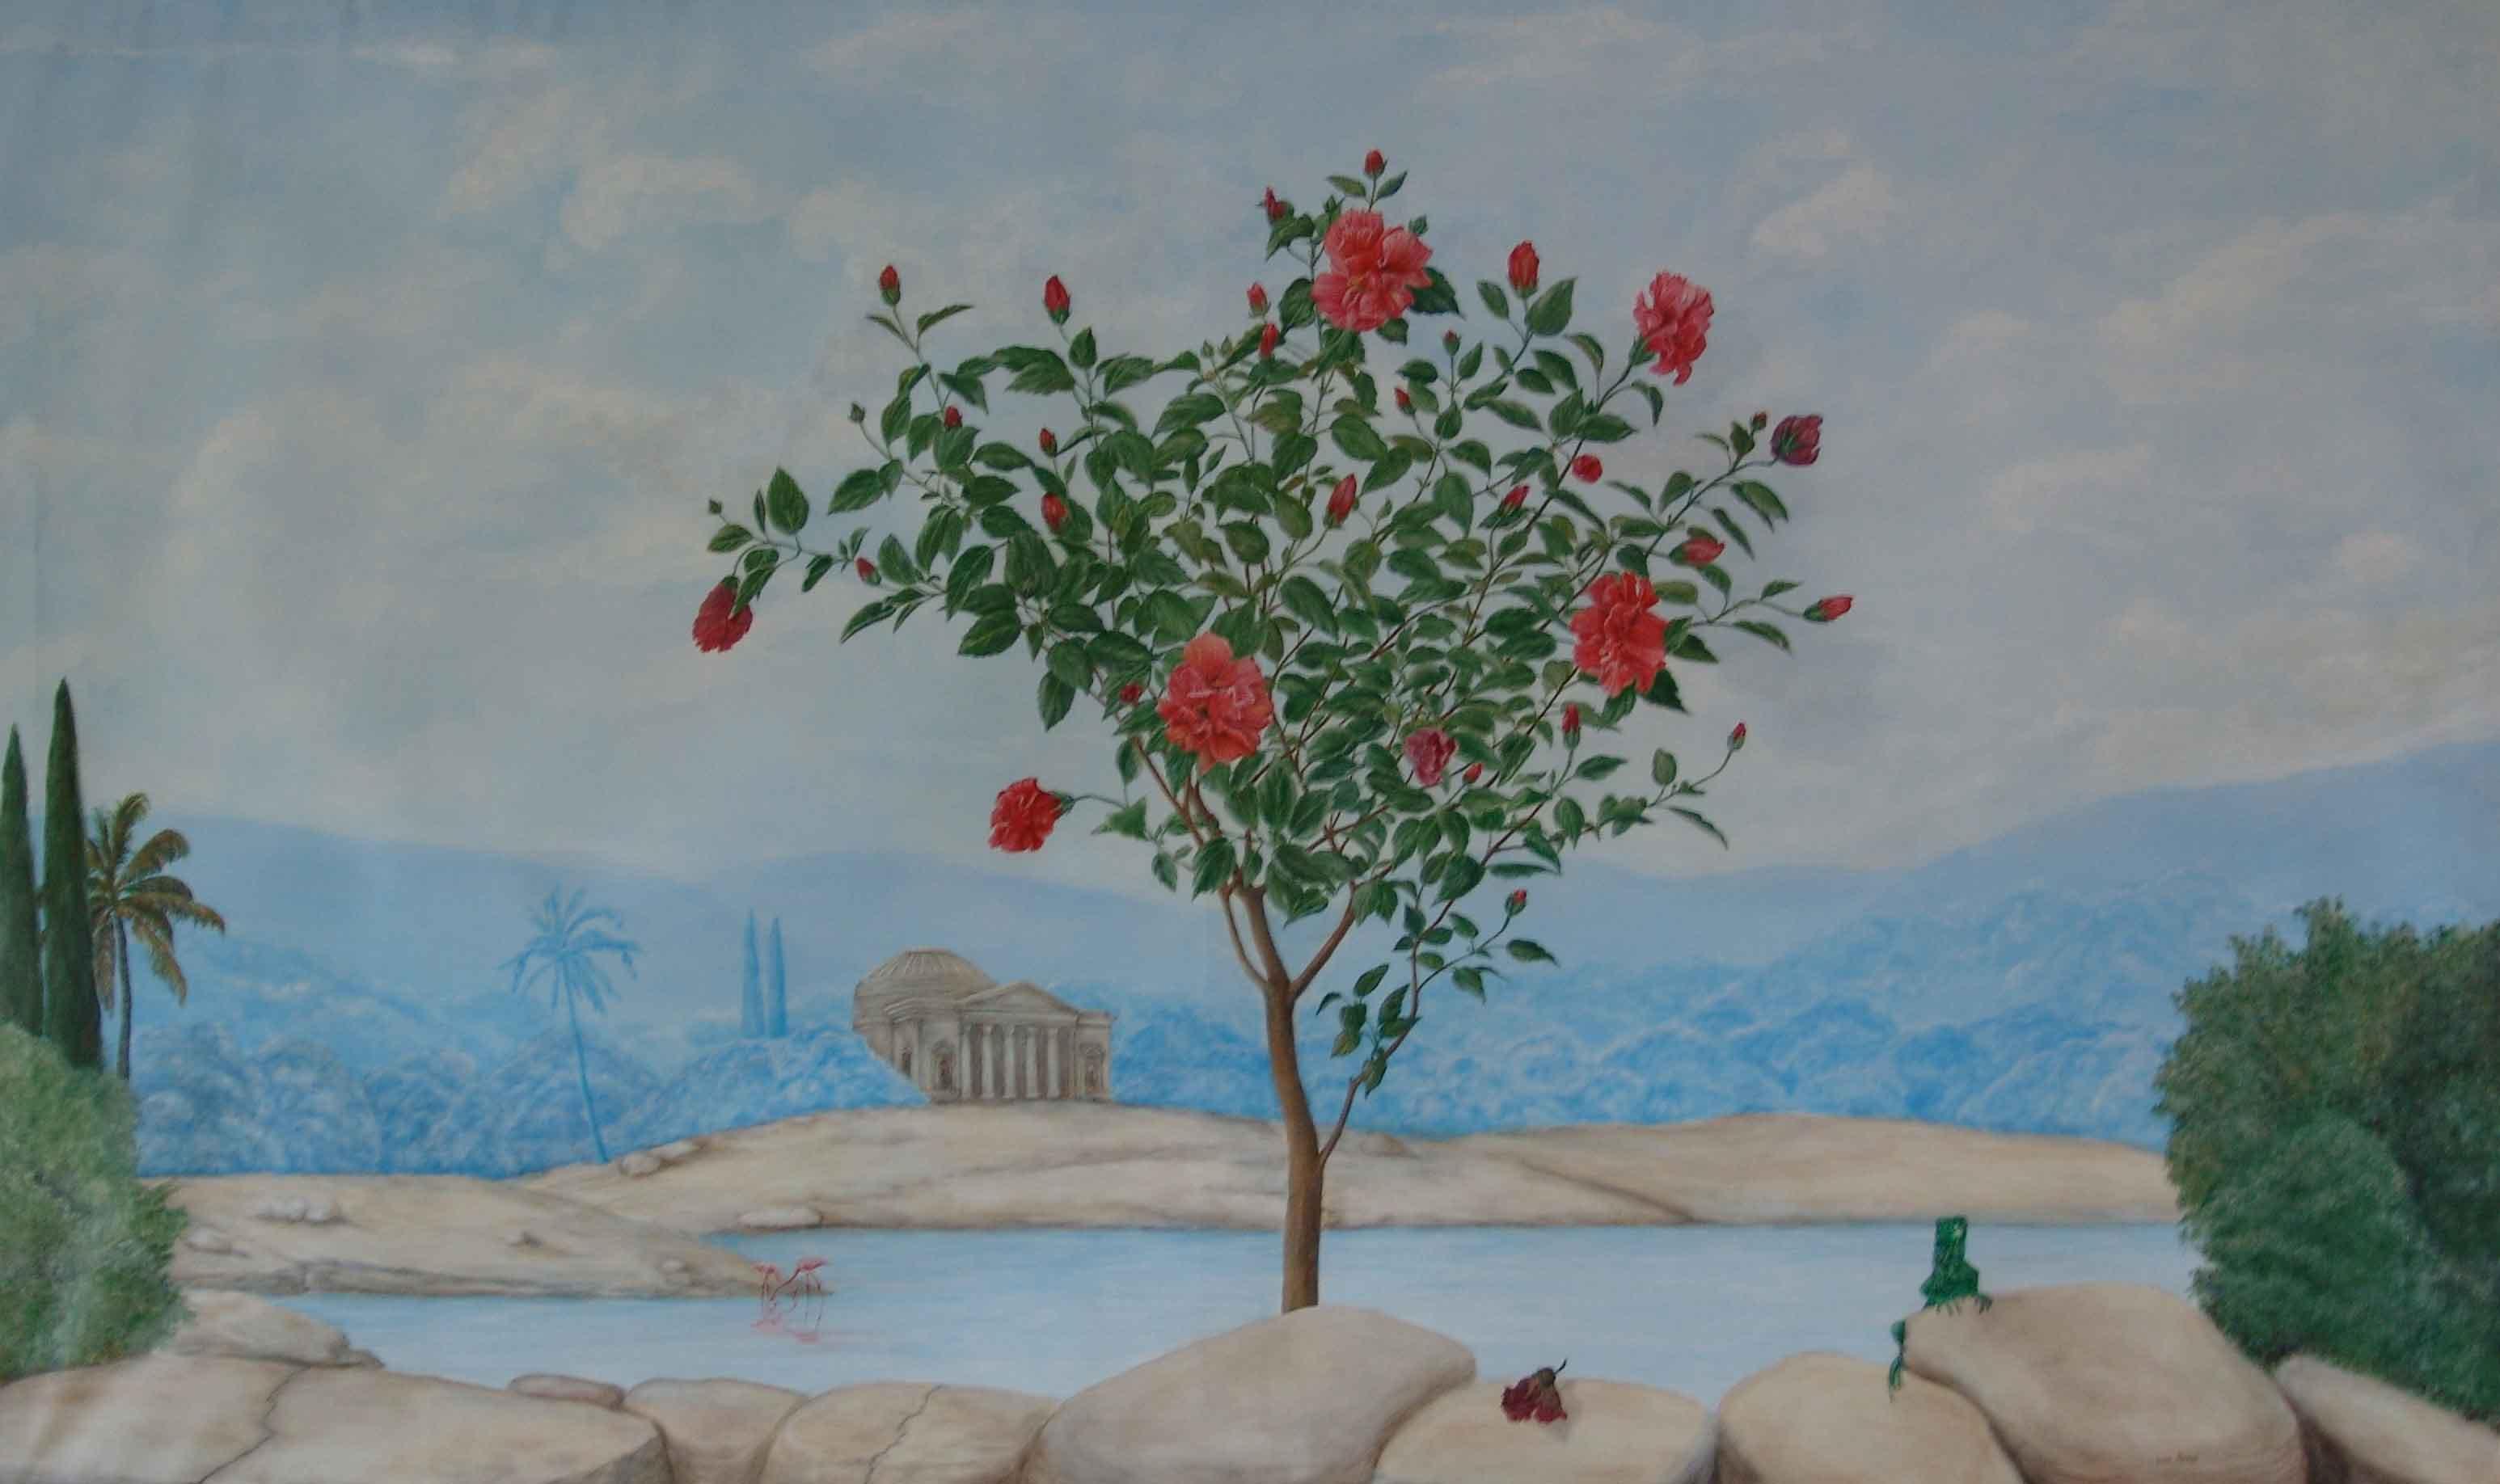 Peinture murale trompe l 39 oeil hibiscus - Trompe l oeil peinture ...